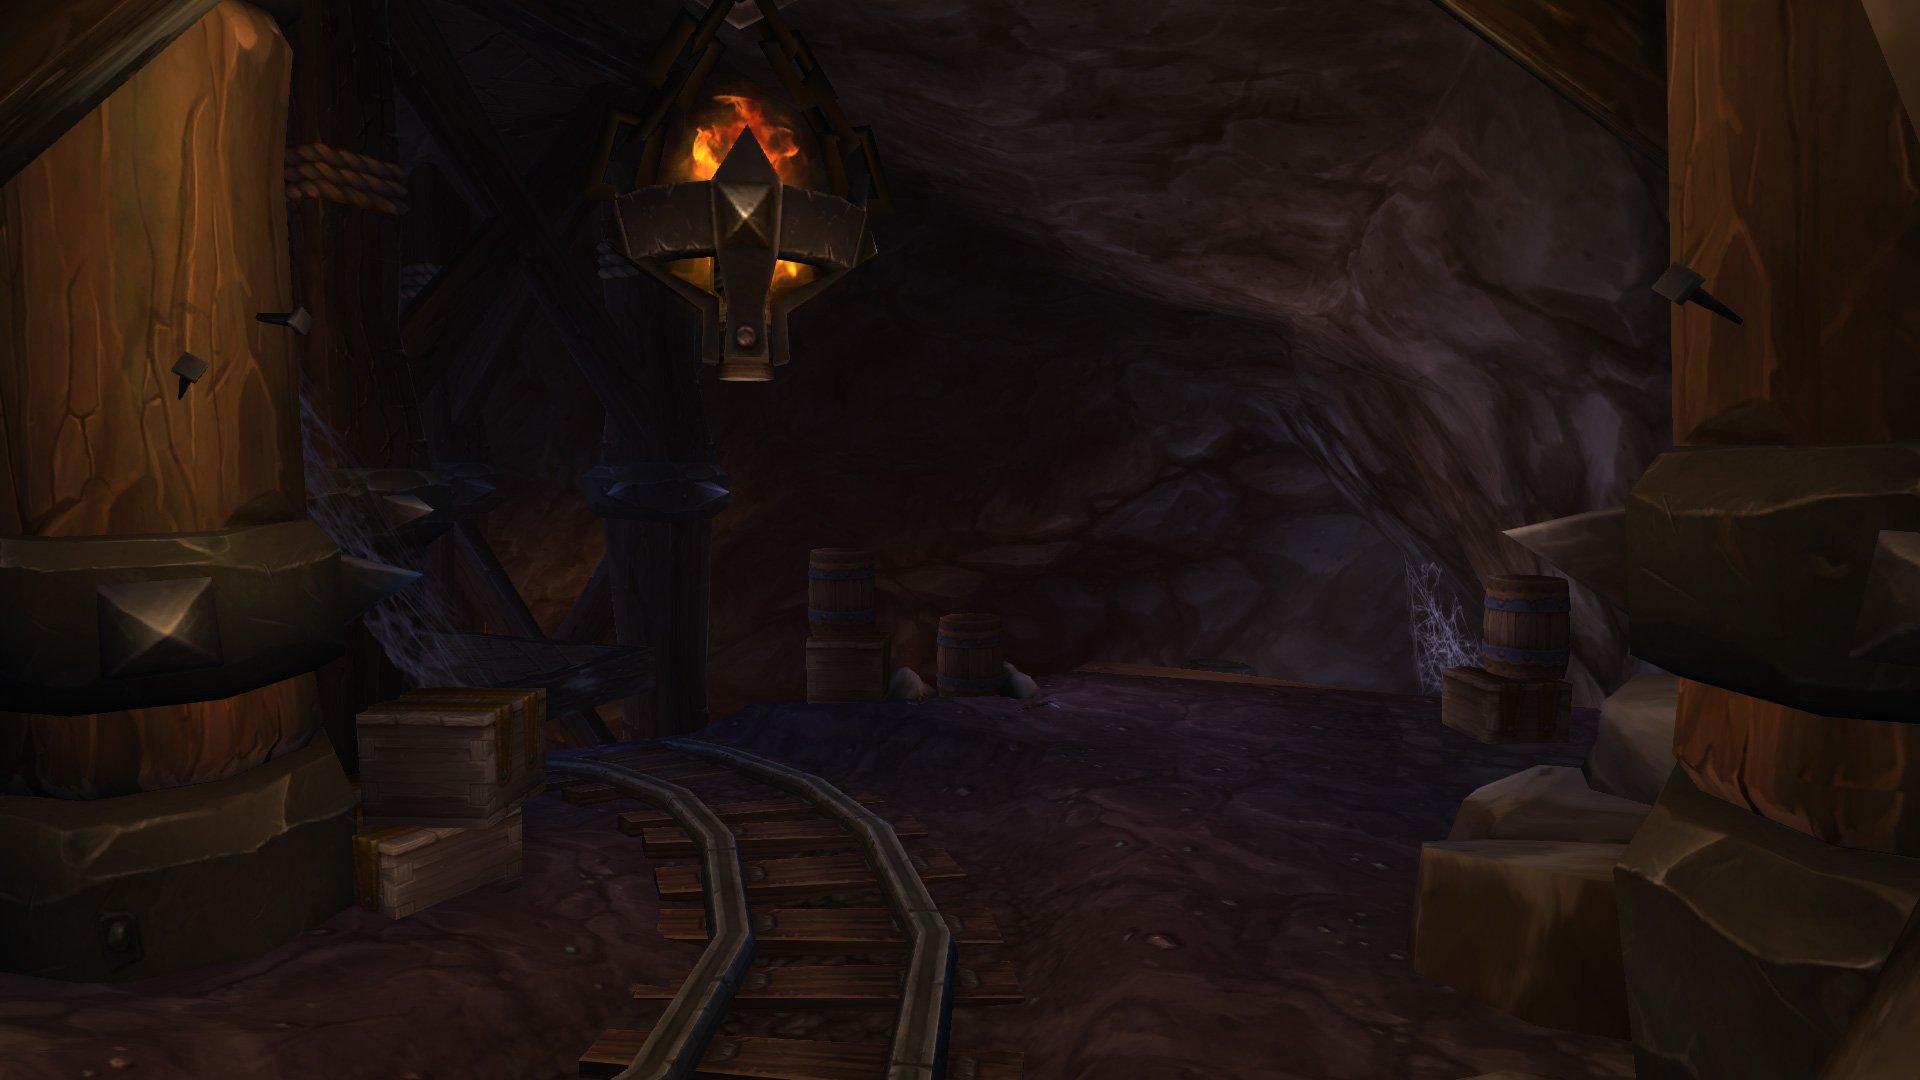 Warlords of draenor garrisons lunarfall excavation frostwall level 2 screenshots malvernweather Images